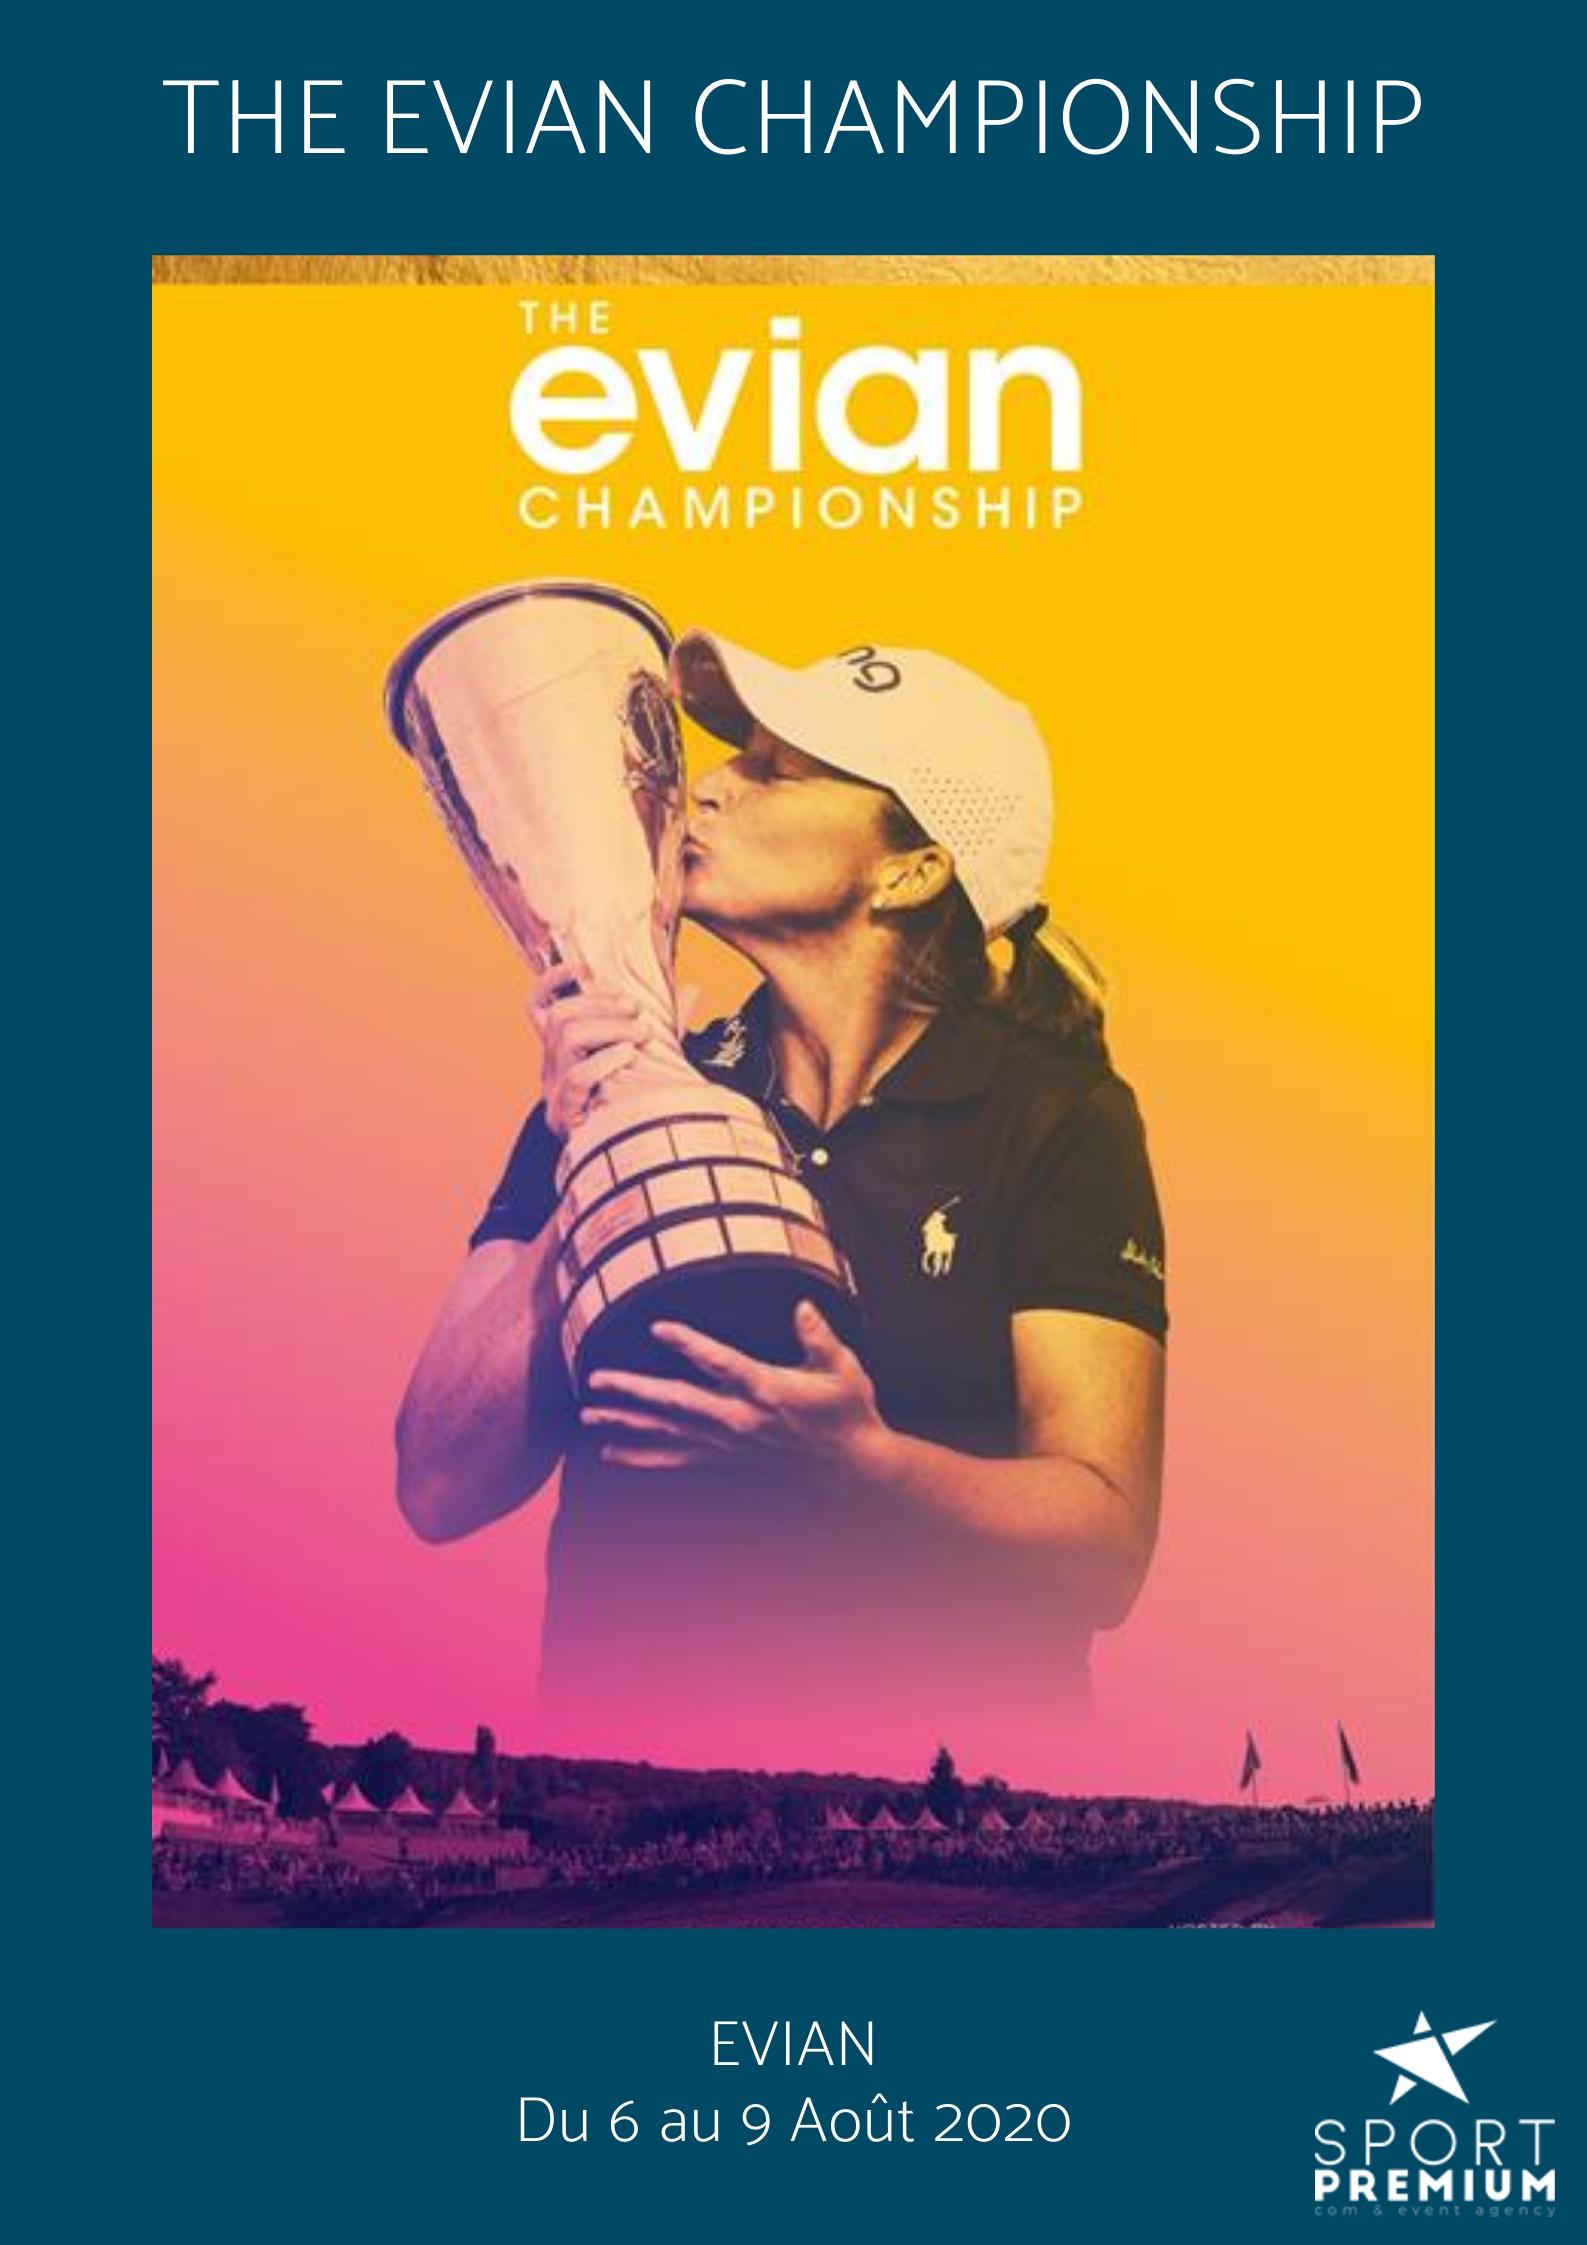 The Evian Championship 1